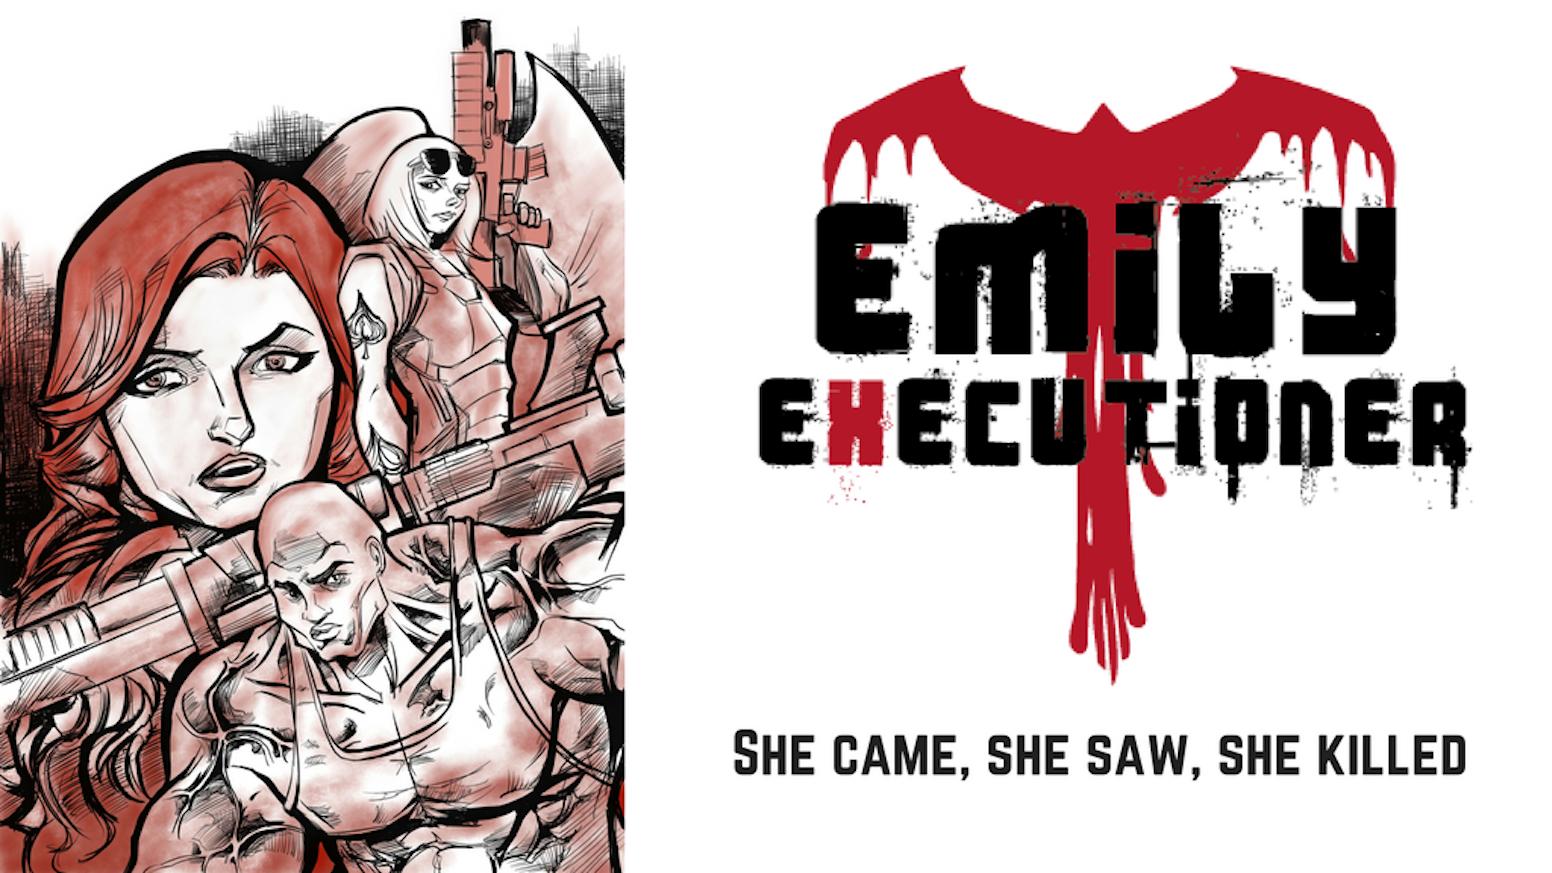 She came, She saw, She killed.